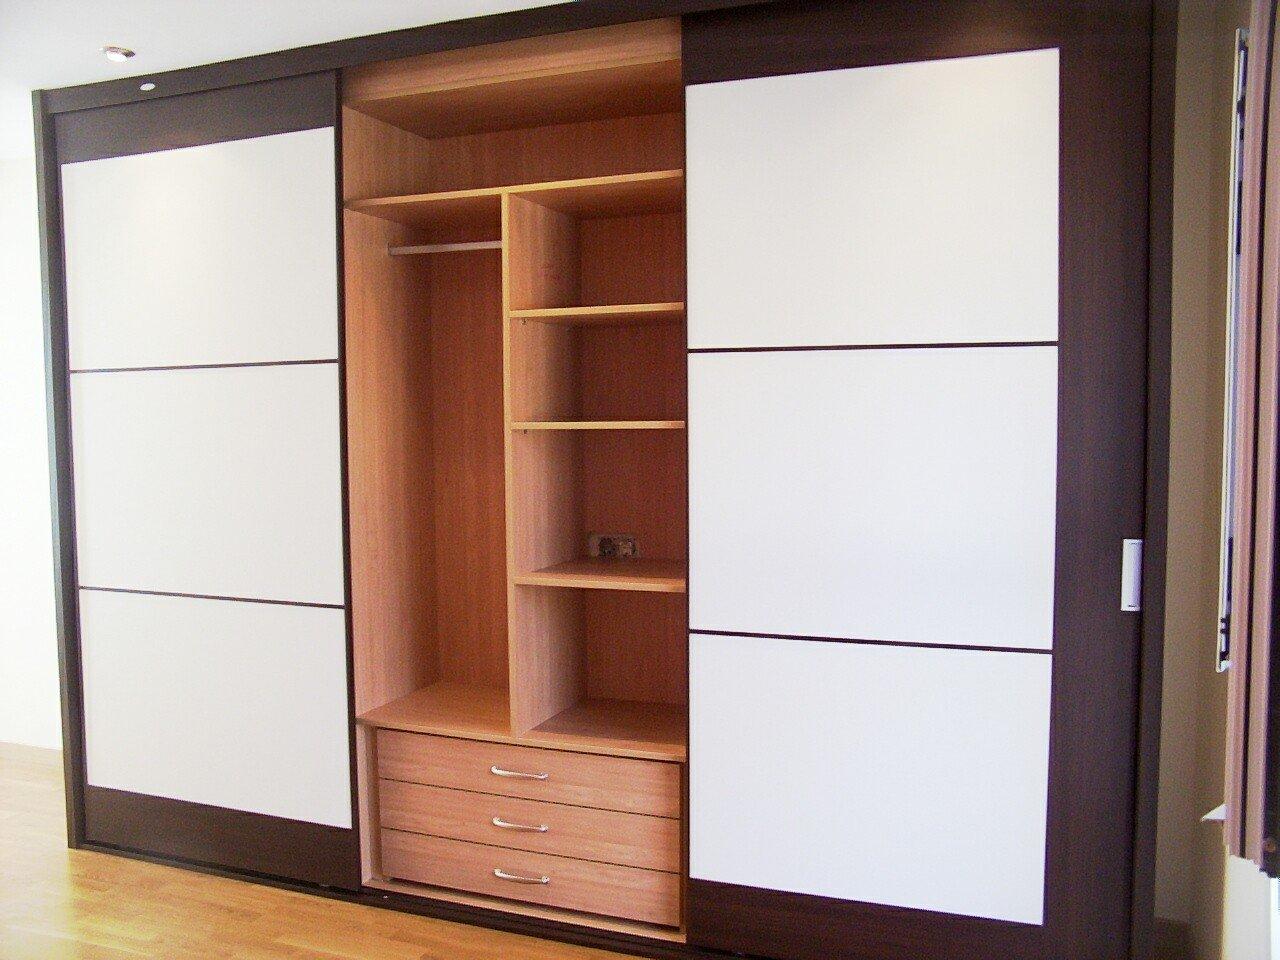 Armarios Exentos O Empotrados Disarycor Carpintero En Granada  # Muebles Vestidor Baratos